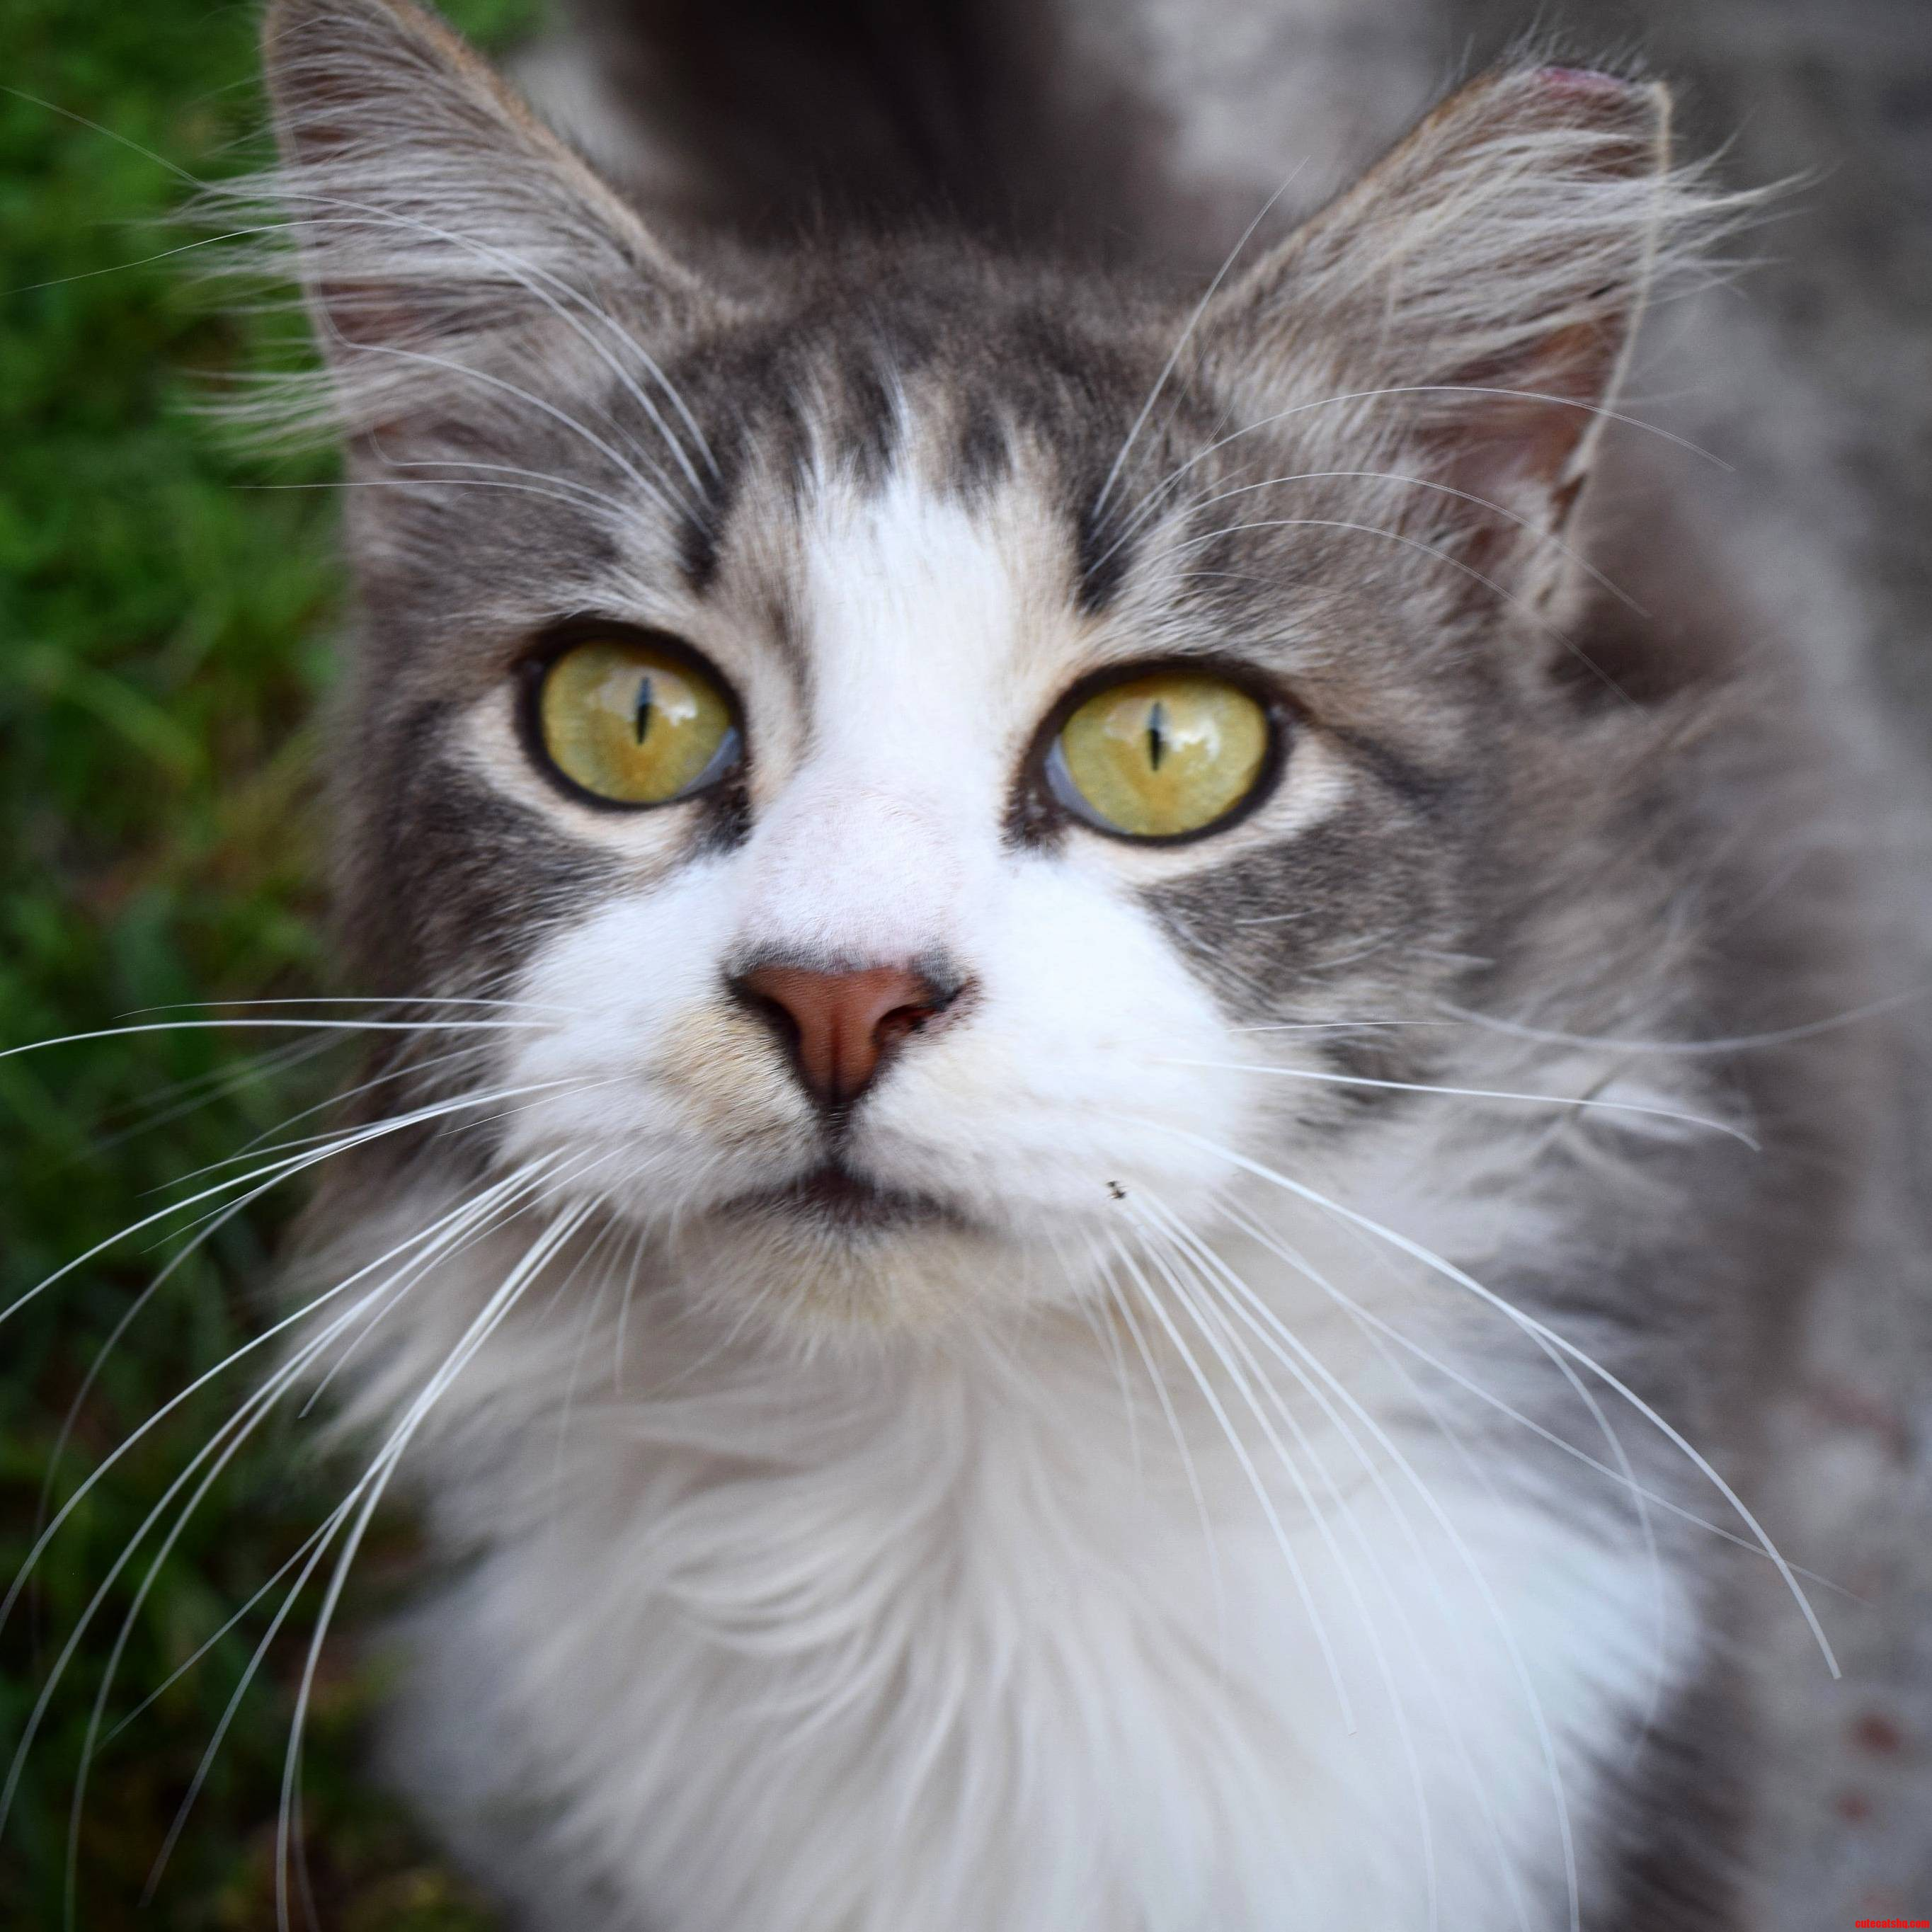 My beautiful furry friend.